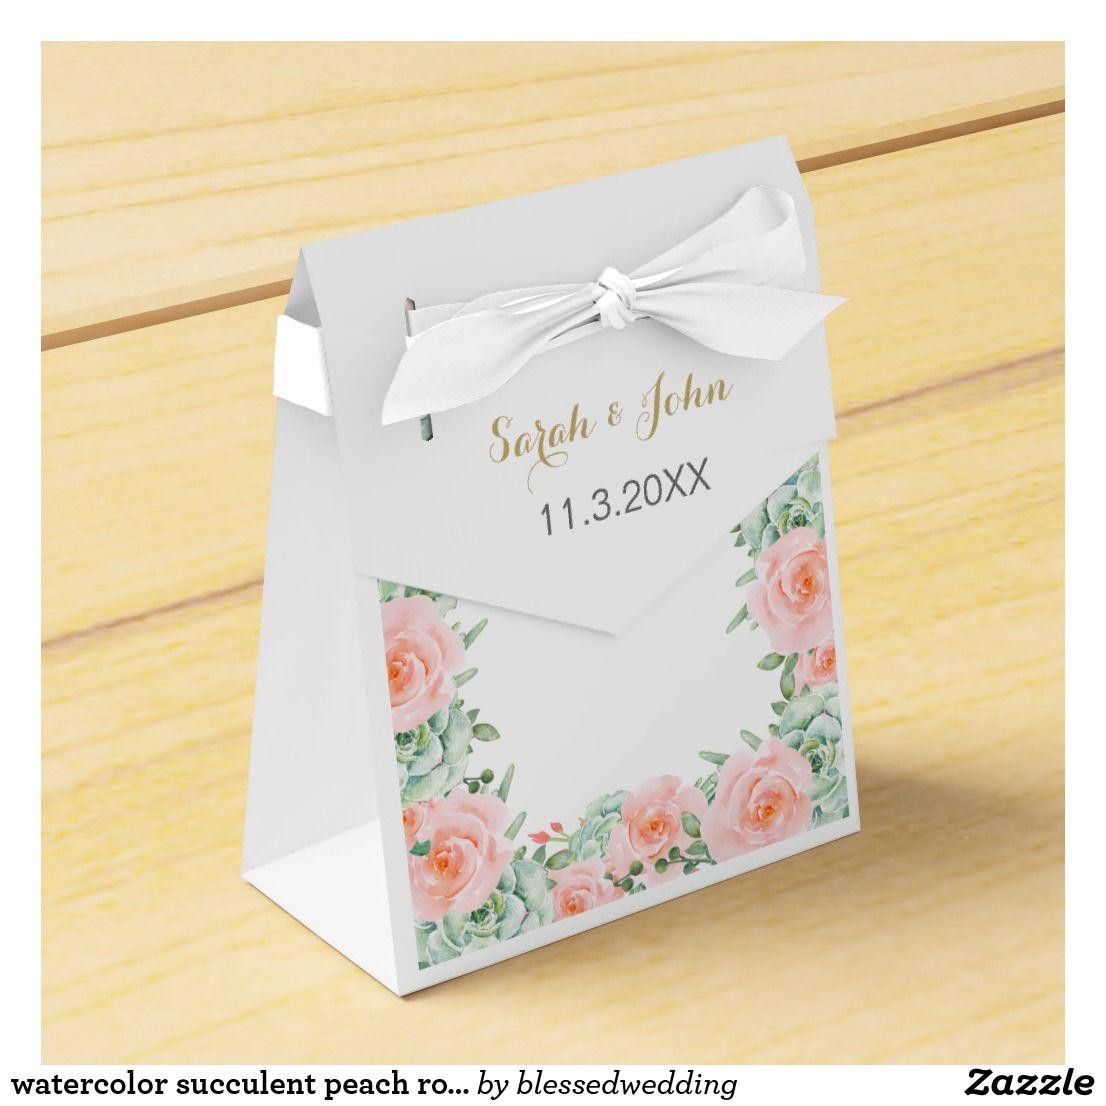 Watercolor succulent peach roses wedding favor box | Watercolor ...